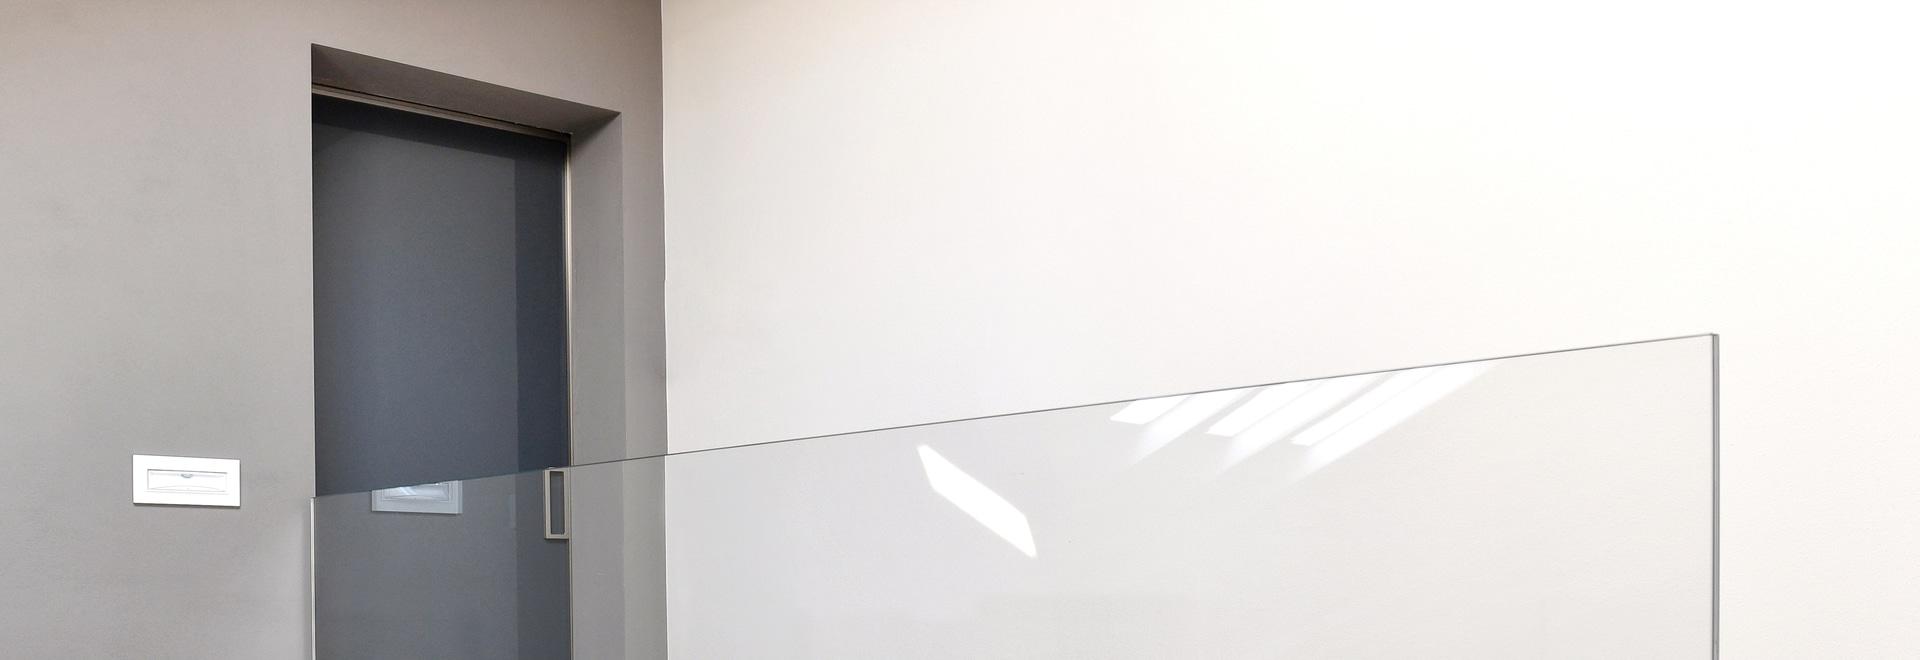 Manhattan sliding doors: minimal and contemporay lines